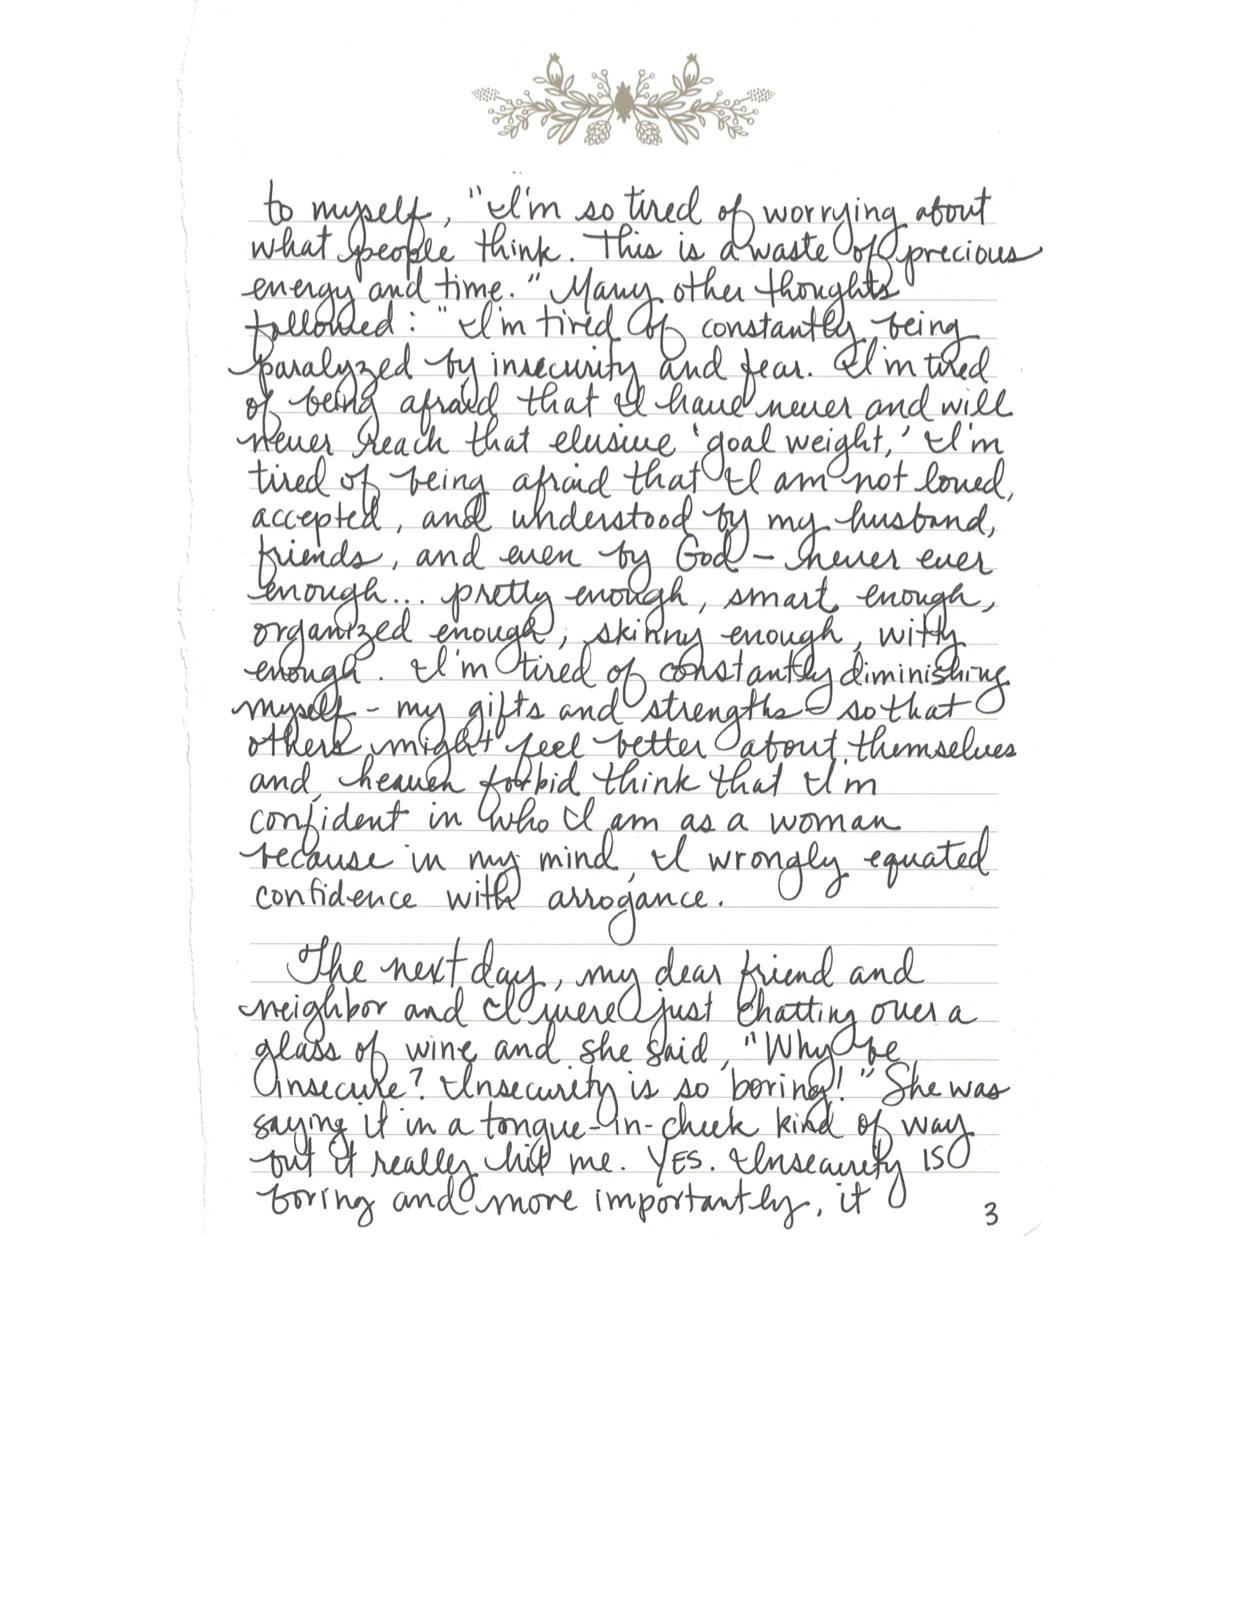 DeAnn_Malcolm_Handwritten3.jpg